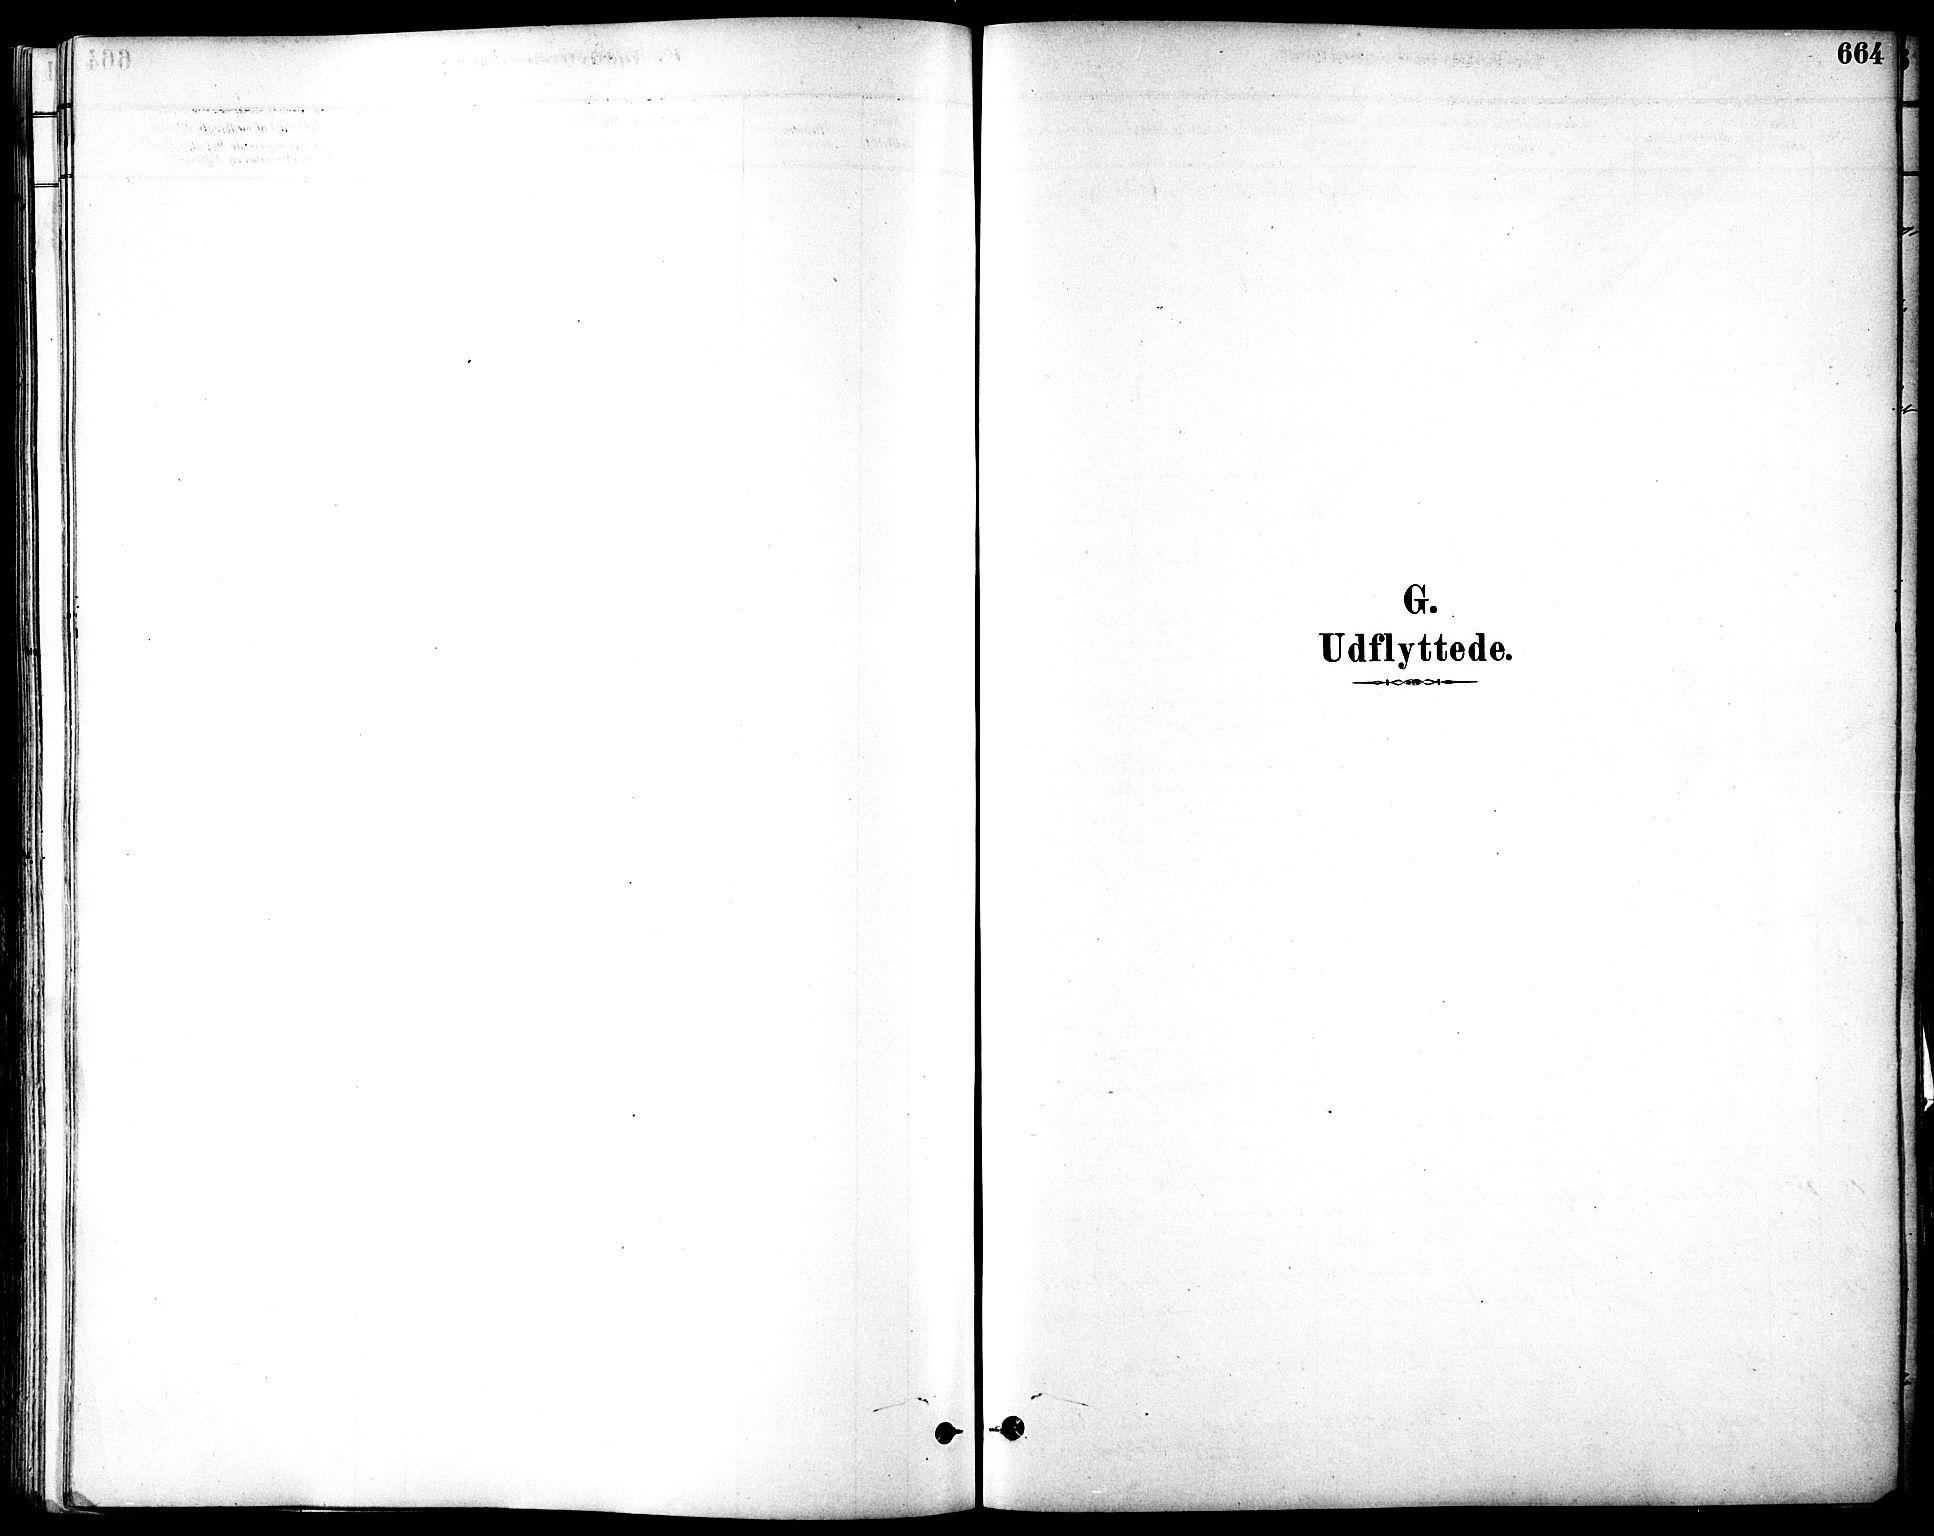 SAT, Ministerialprotokoller, klokkerbøker og fødselsregistre - Sør-Trøndelag, 601/L0058: Parish register (official) no. 601A26, 1877-1891, p. 664